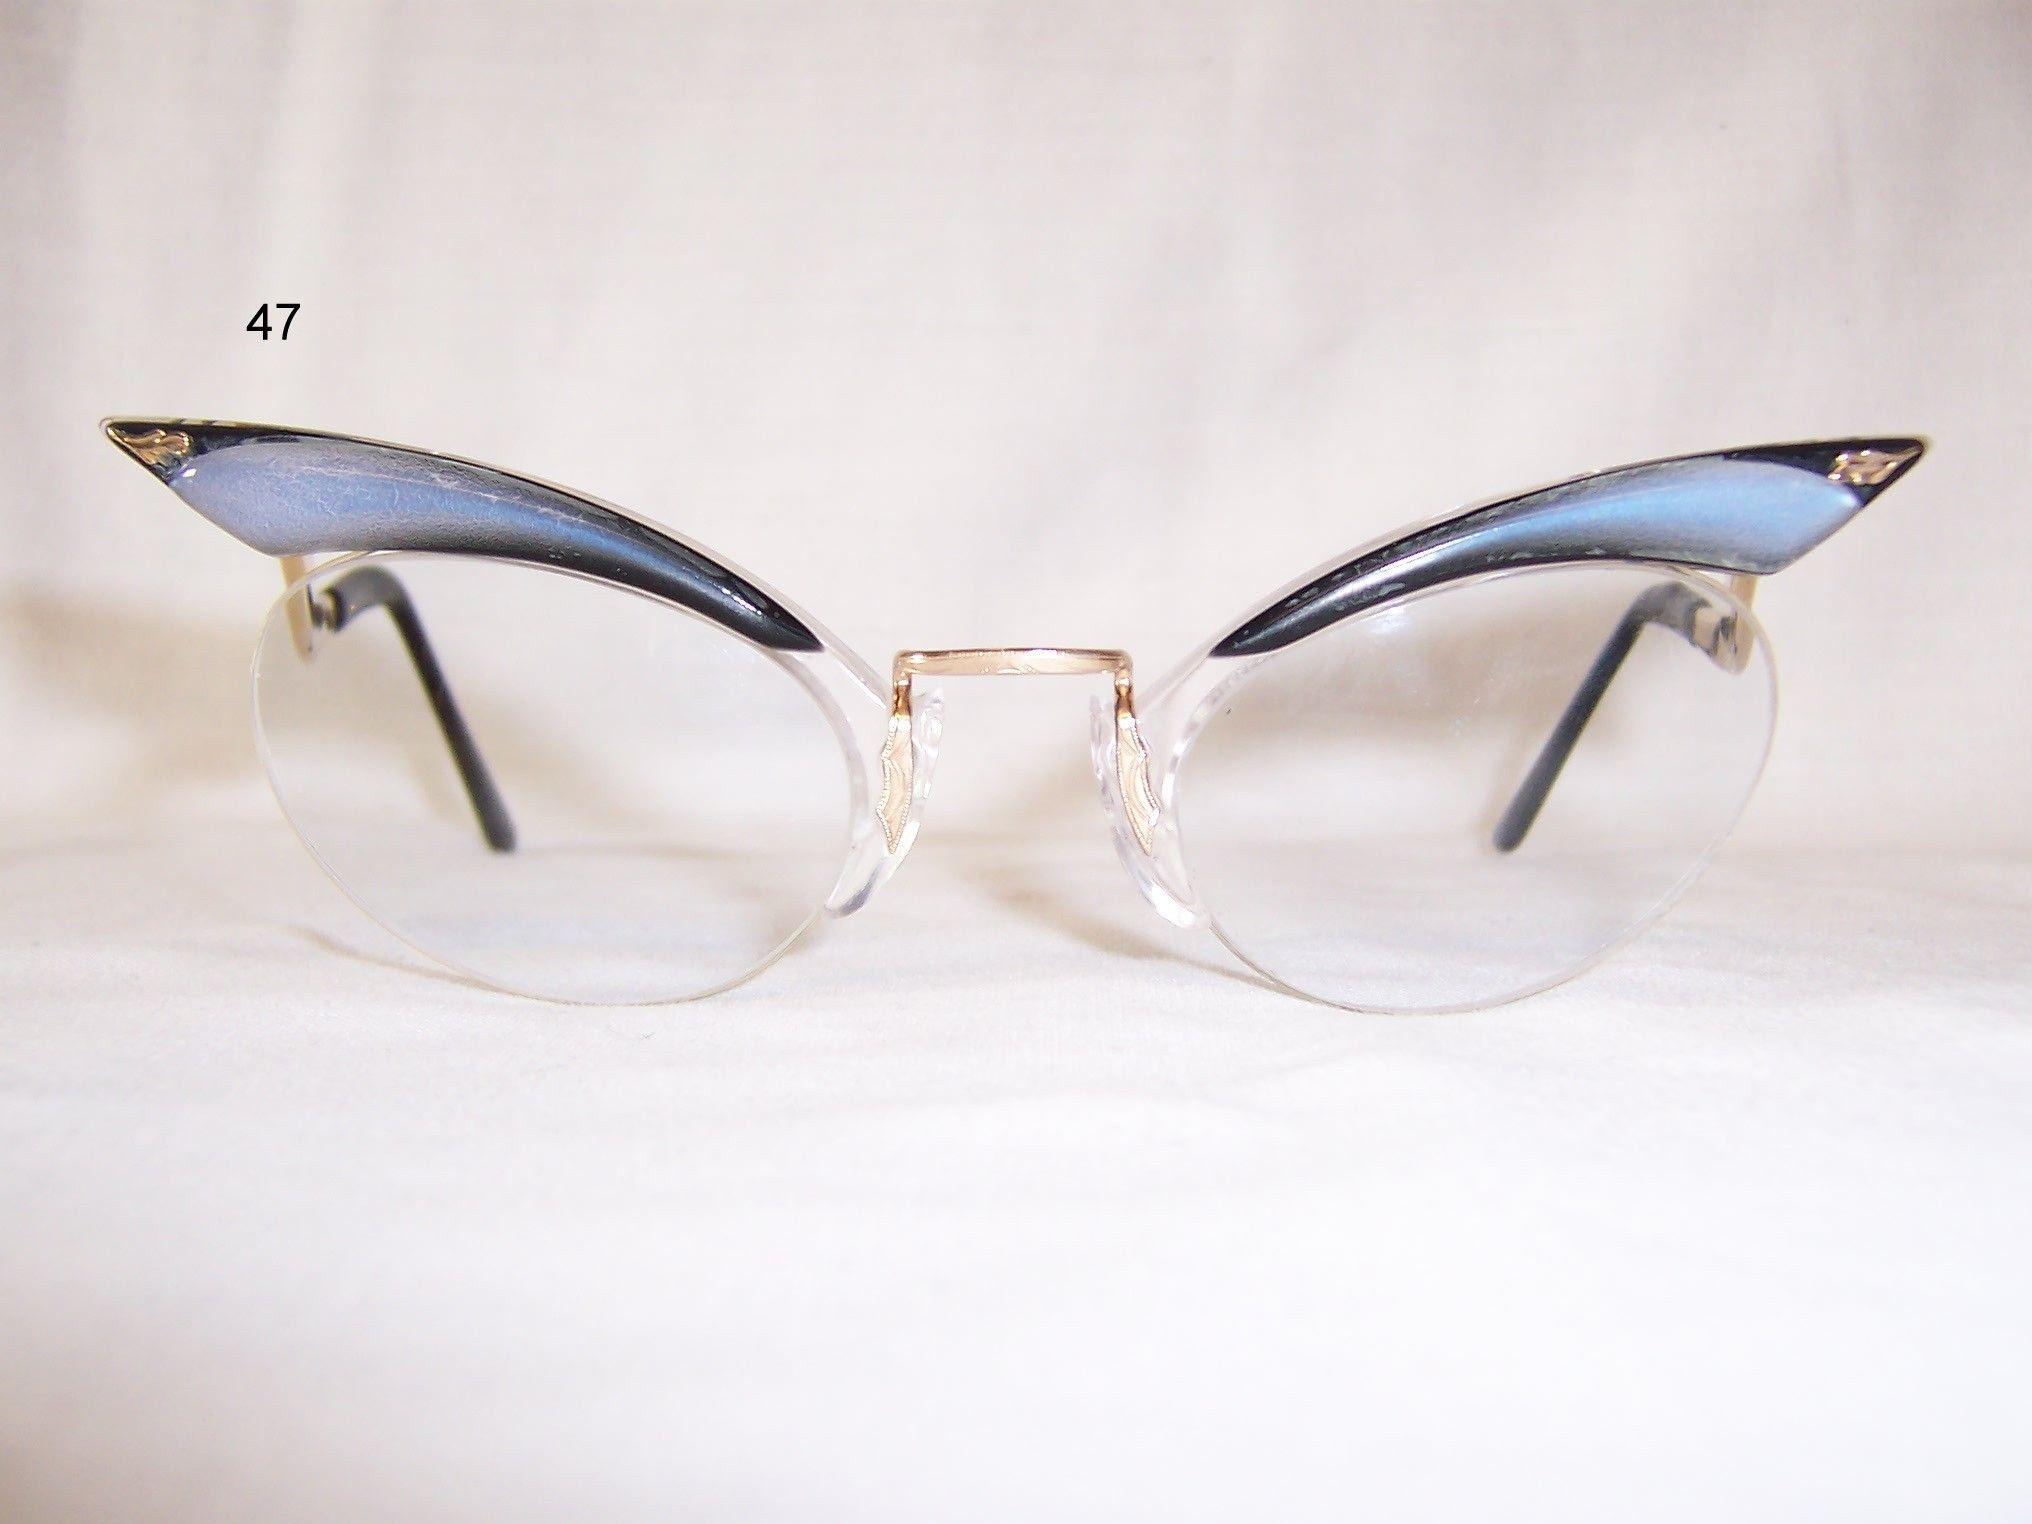 a3f2e90cfb Classic 1950 60 s Brow line combination Spectacles - Vintage Glasses - Dead  Men s Spex